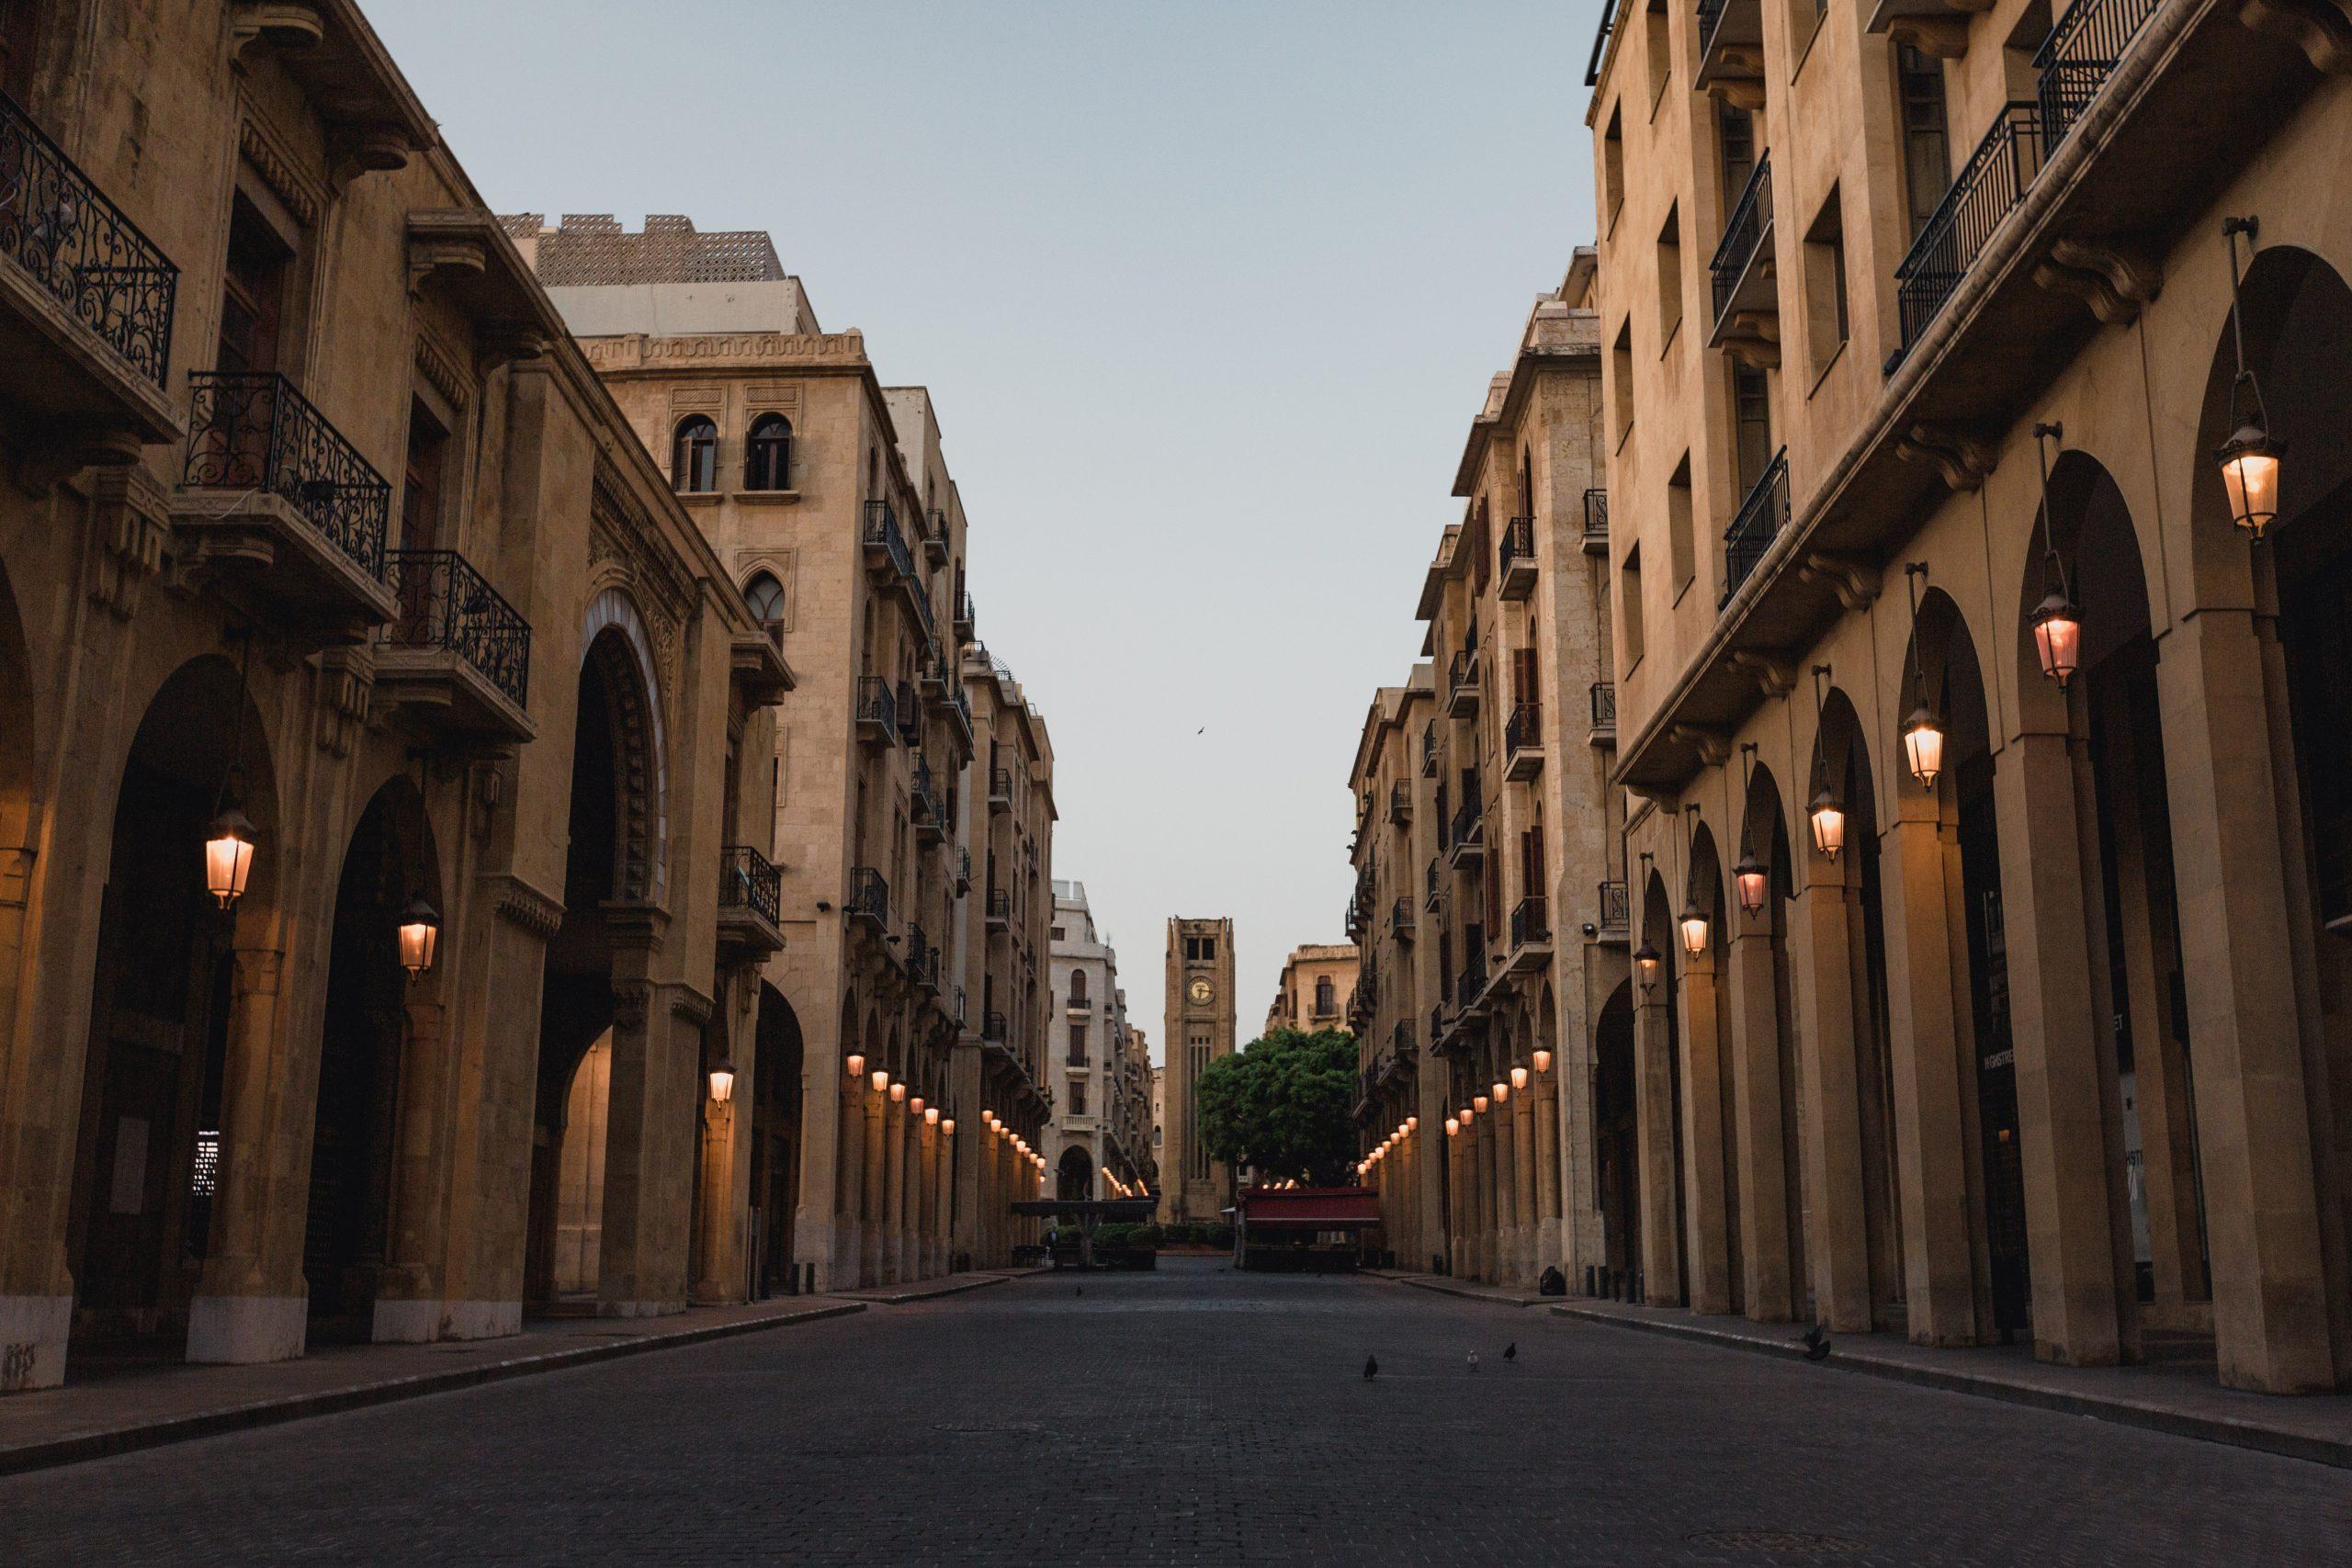 Beirut airport to city, Beirut airport to city center, How To Get From Beirut Airport To City Center